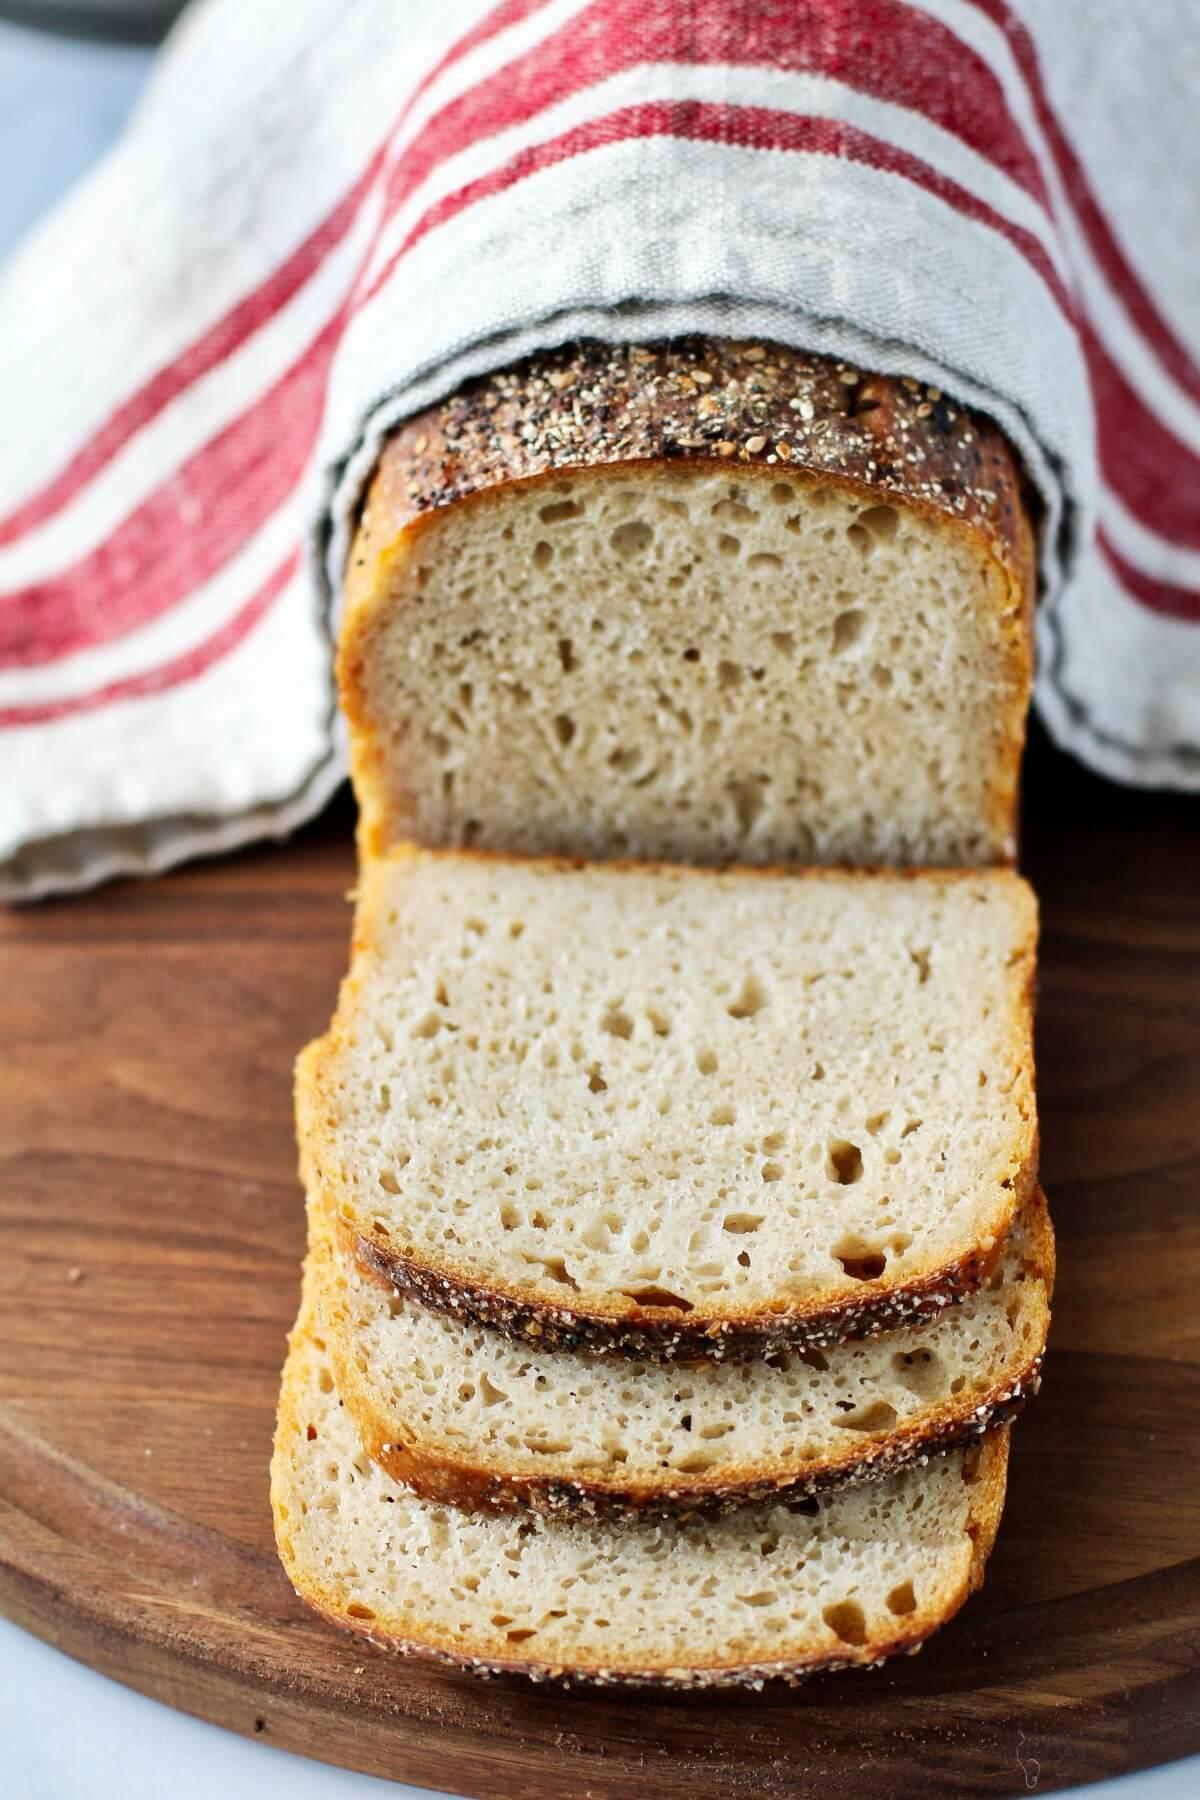 No Knead Sourdough Sandwich Bread with rye.